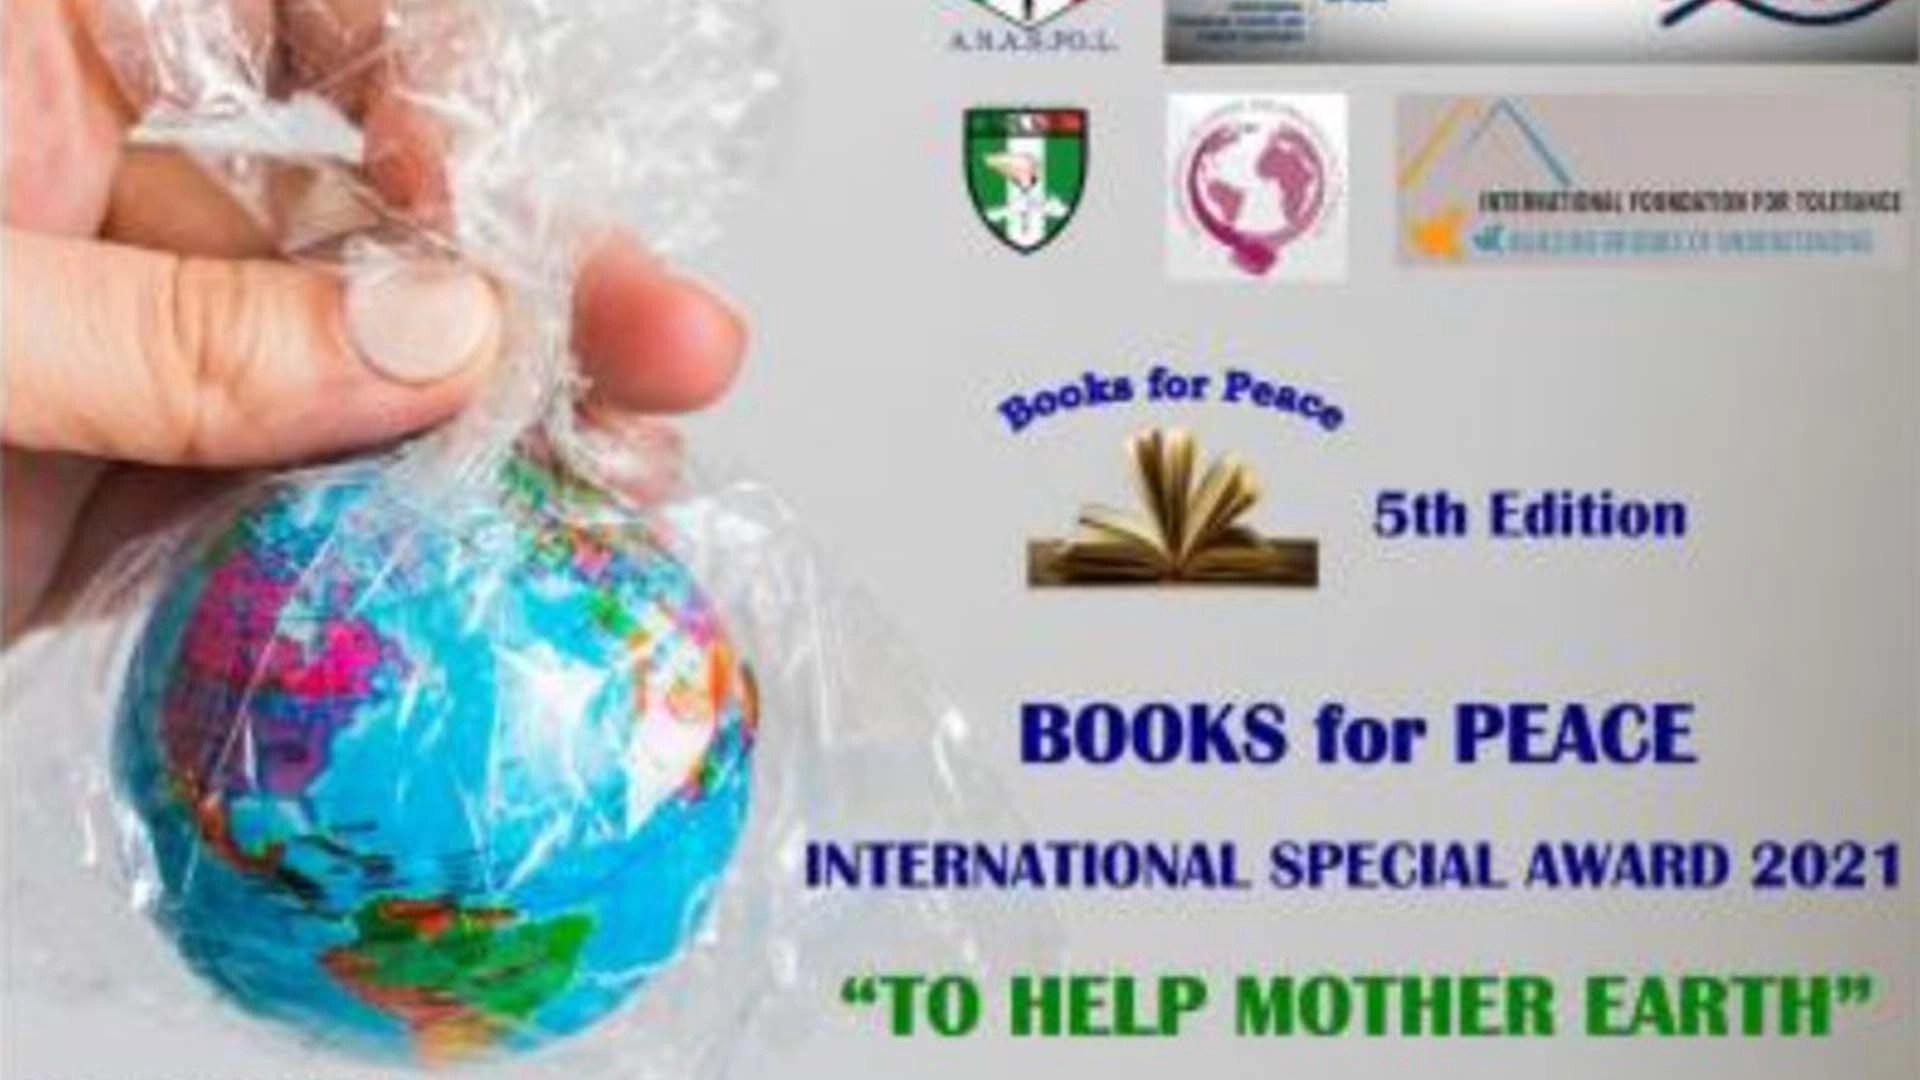 ROMA - Sport Paralimpico BOOKS for PEACE 2021